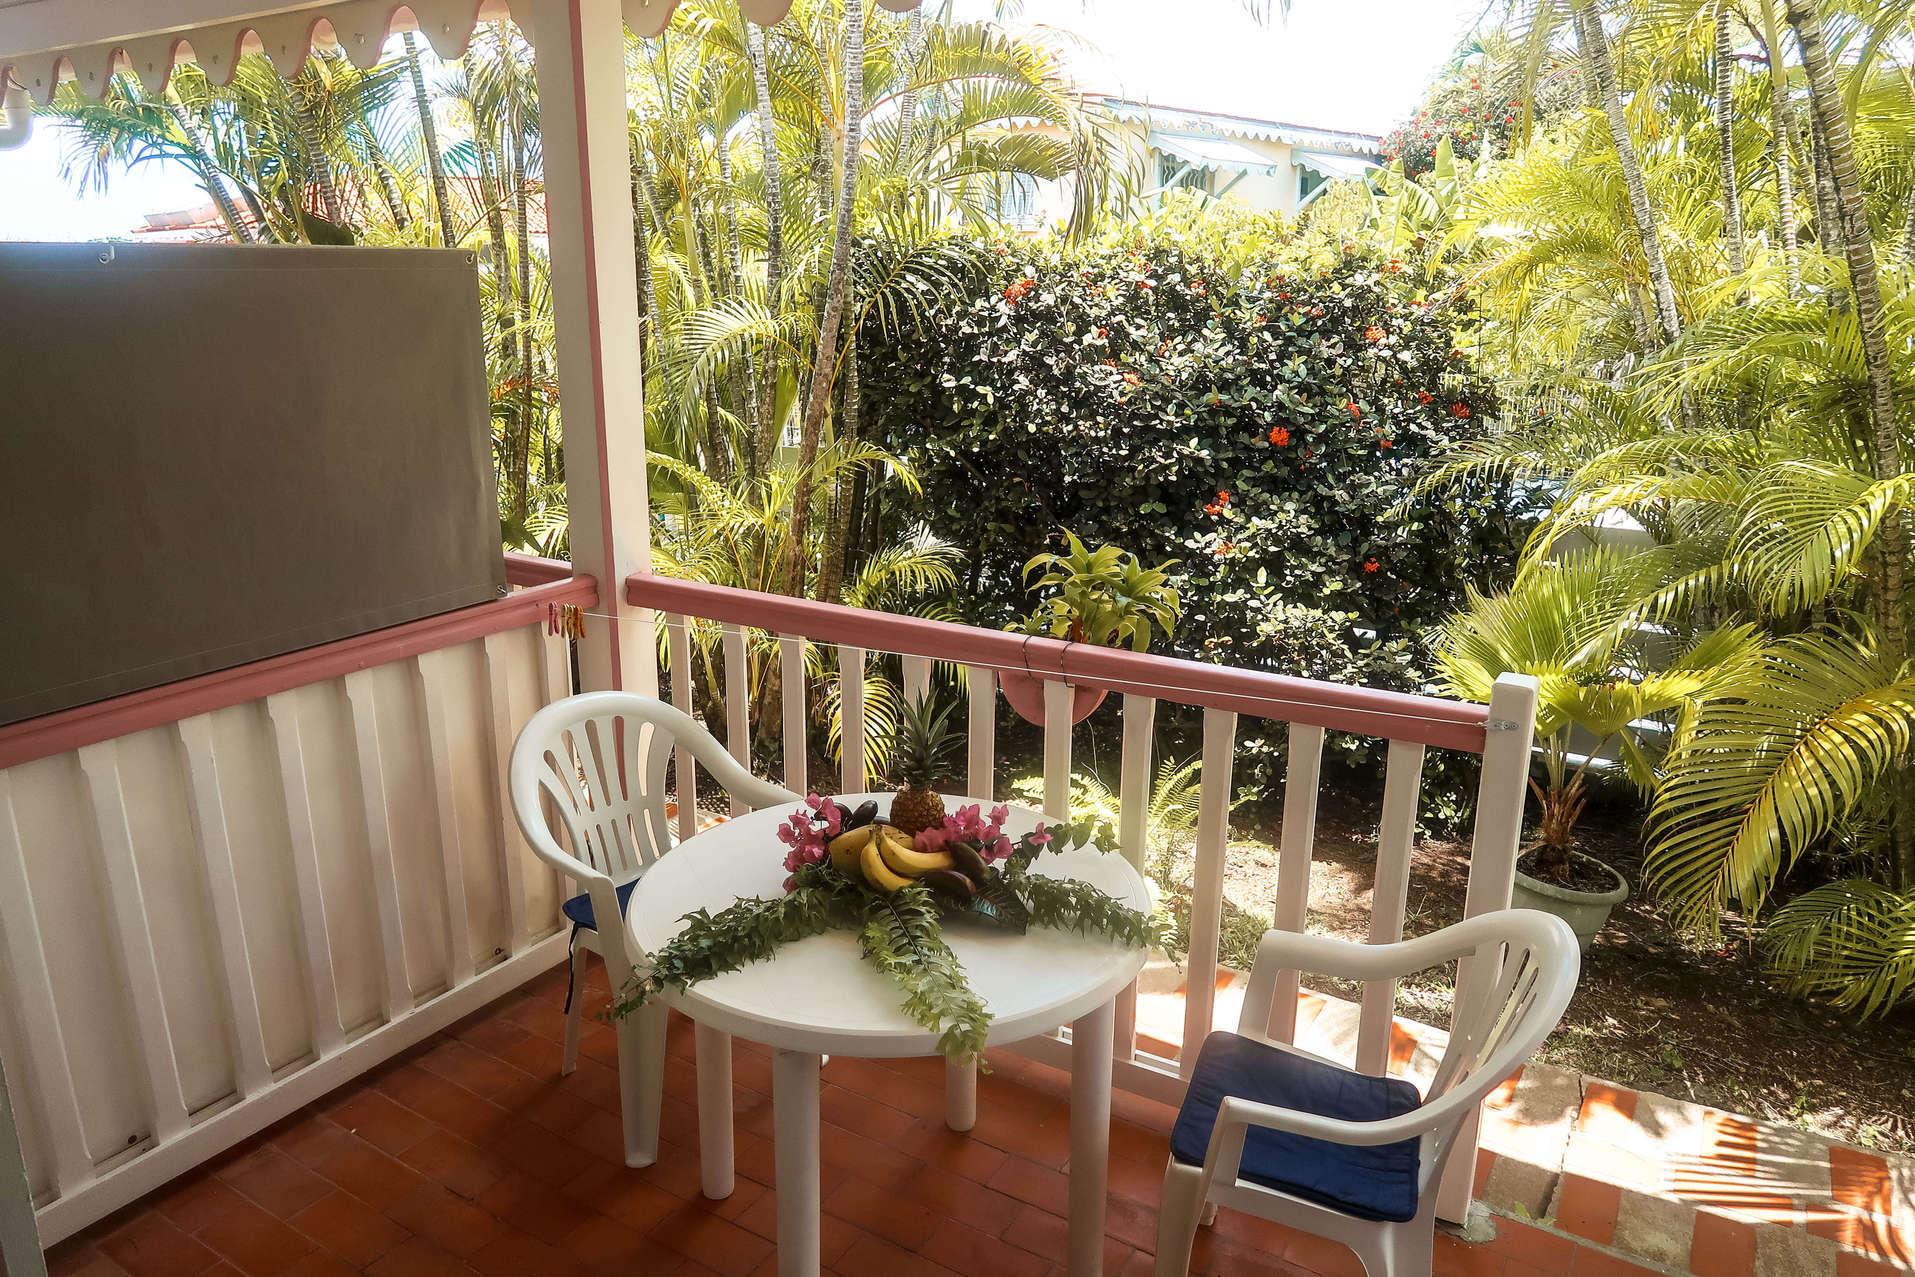 habitation-abricot-location-saisonniere-studio-vue-terrasse-jardin